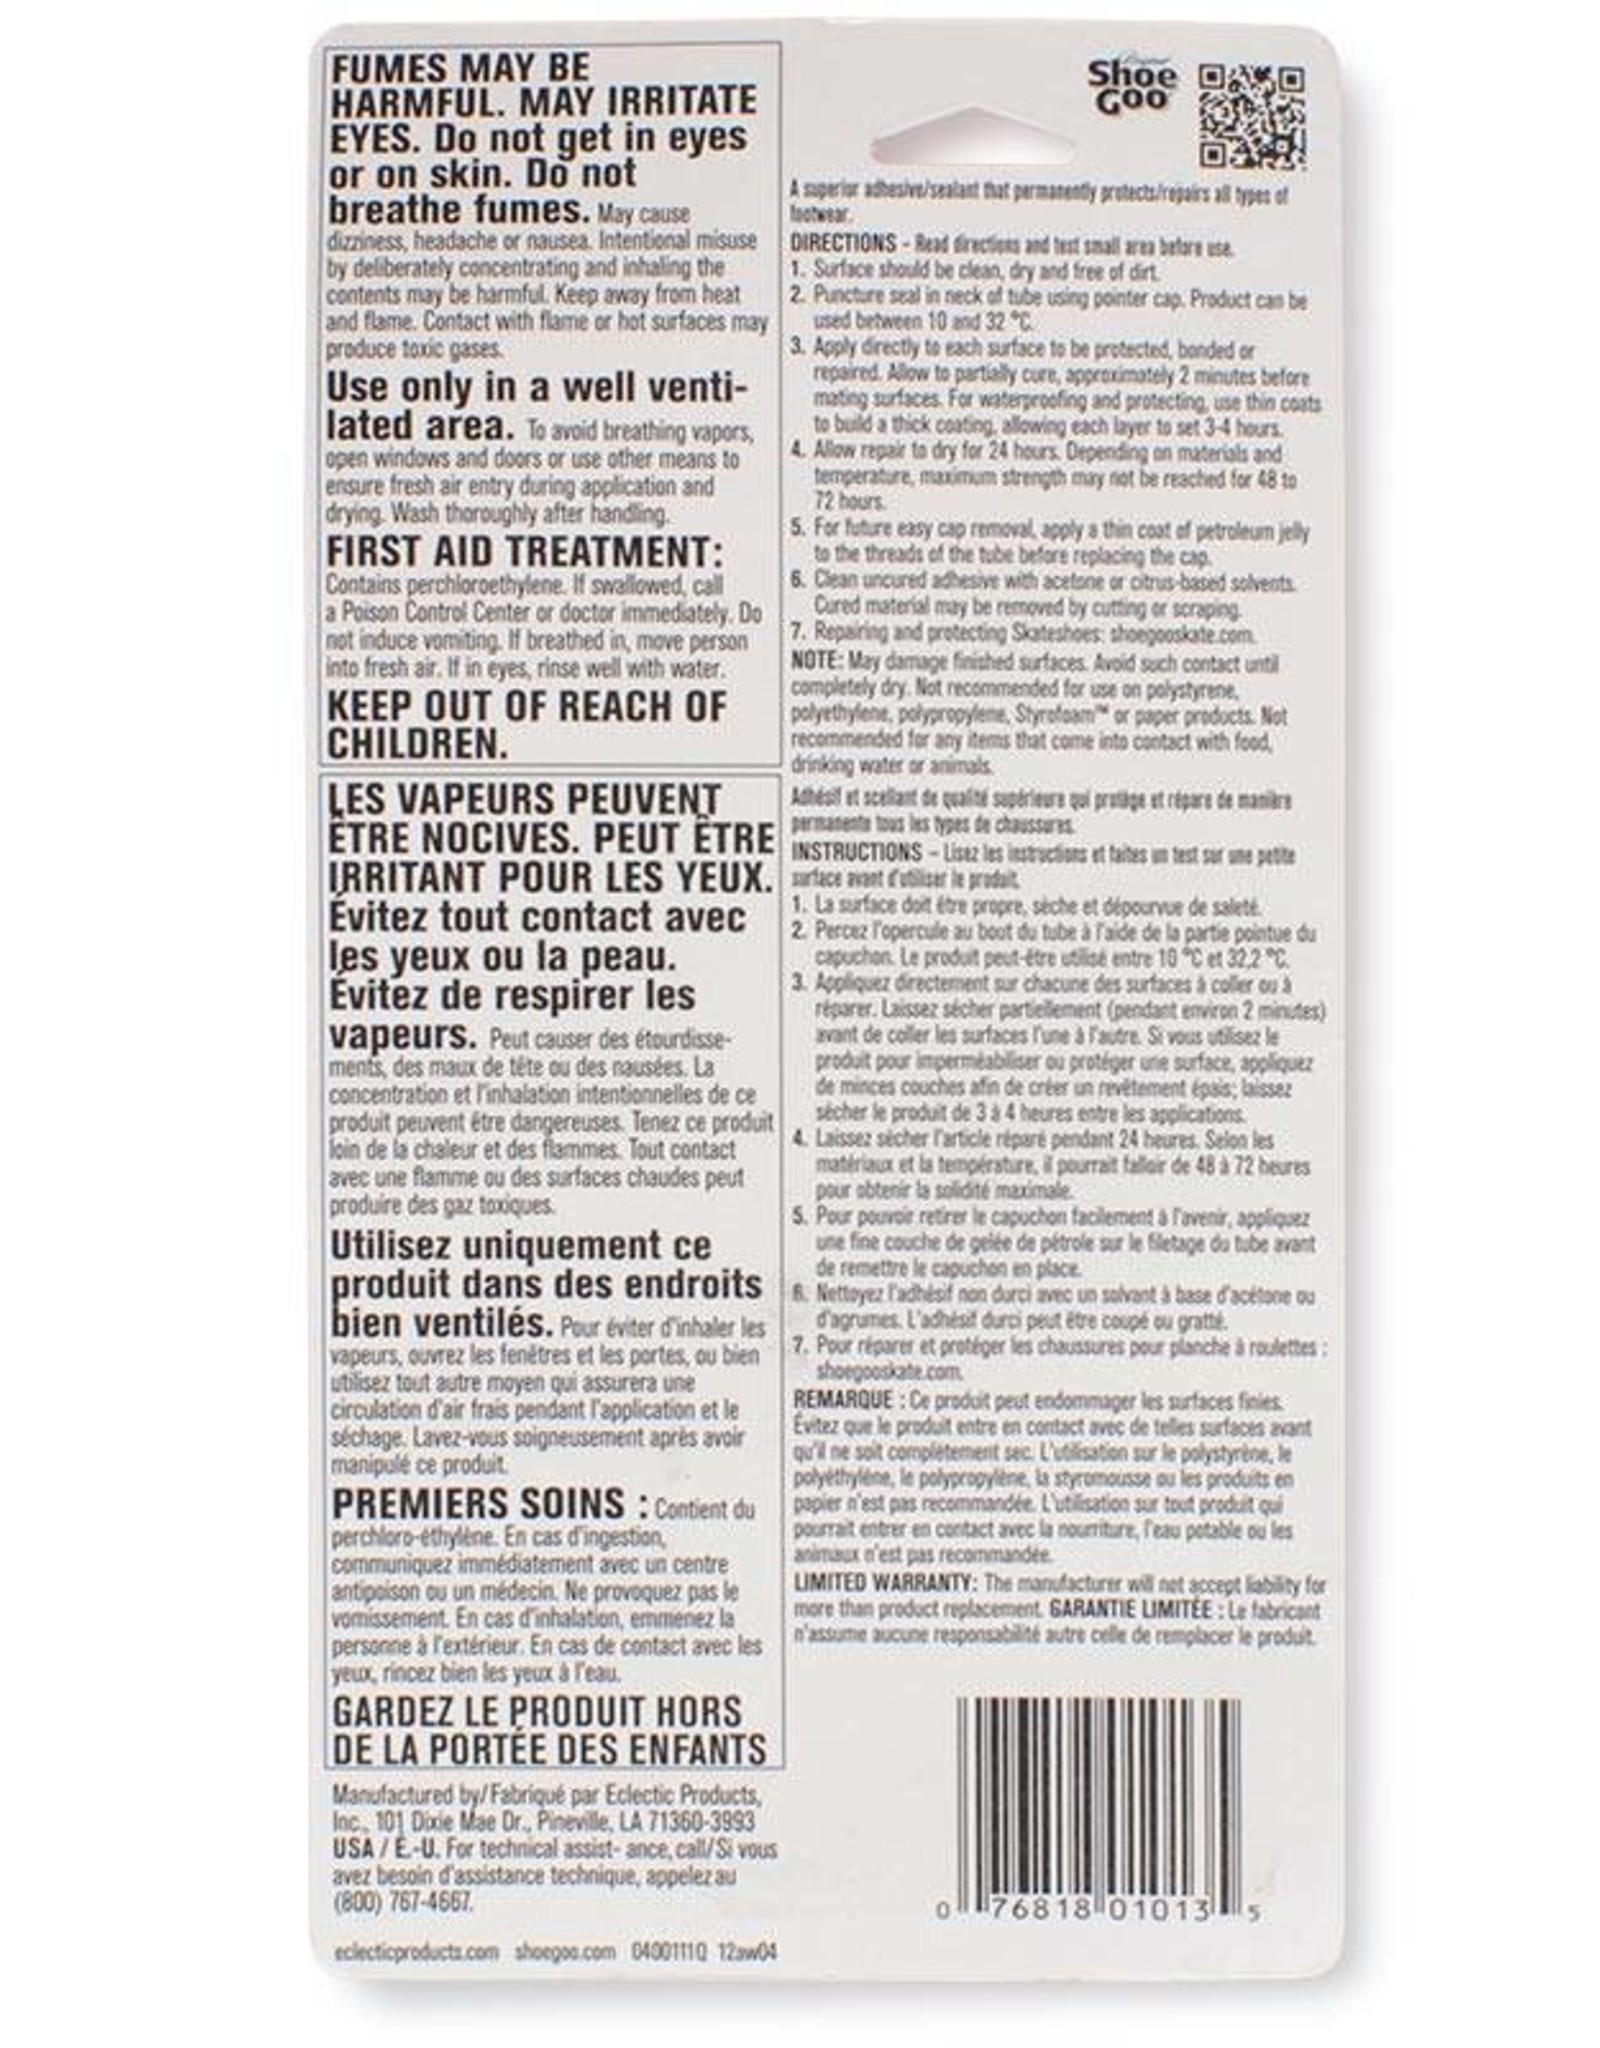 Shoe Goo Shoe Goo Original 110 ml Clear 2-Pack with 10% Discount